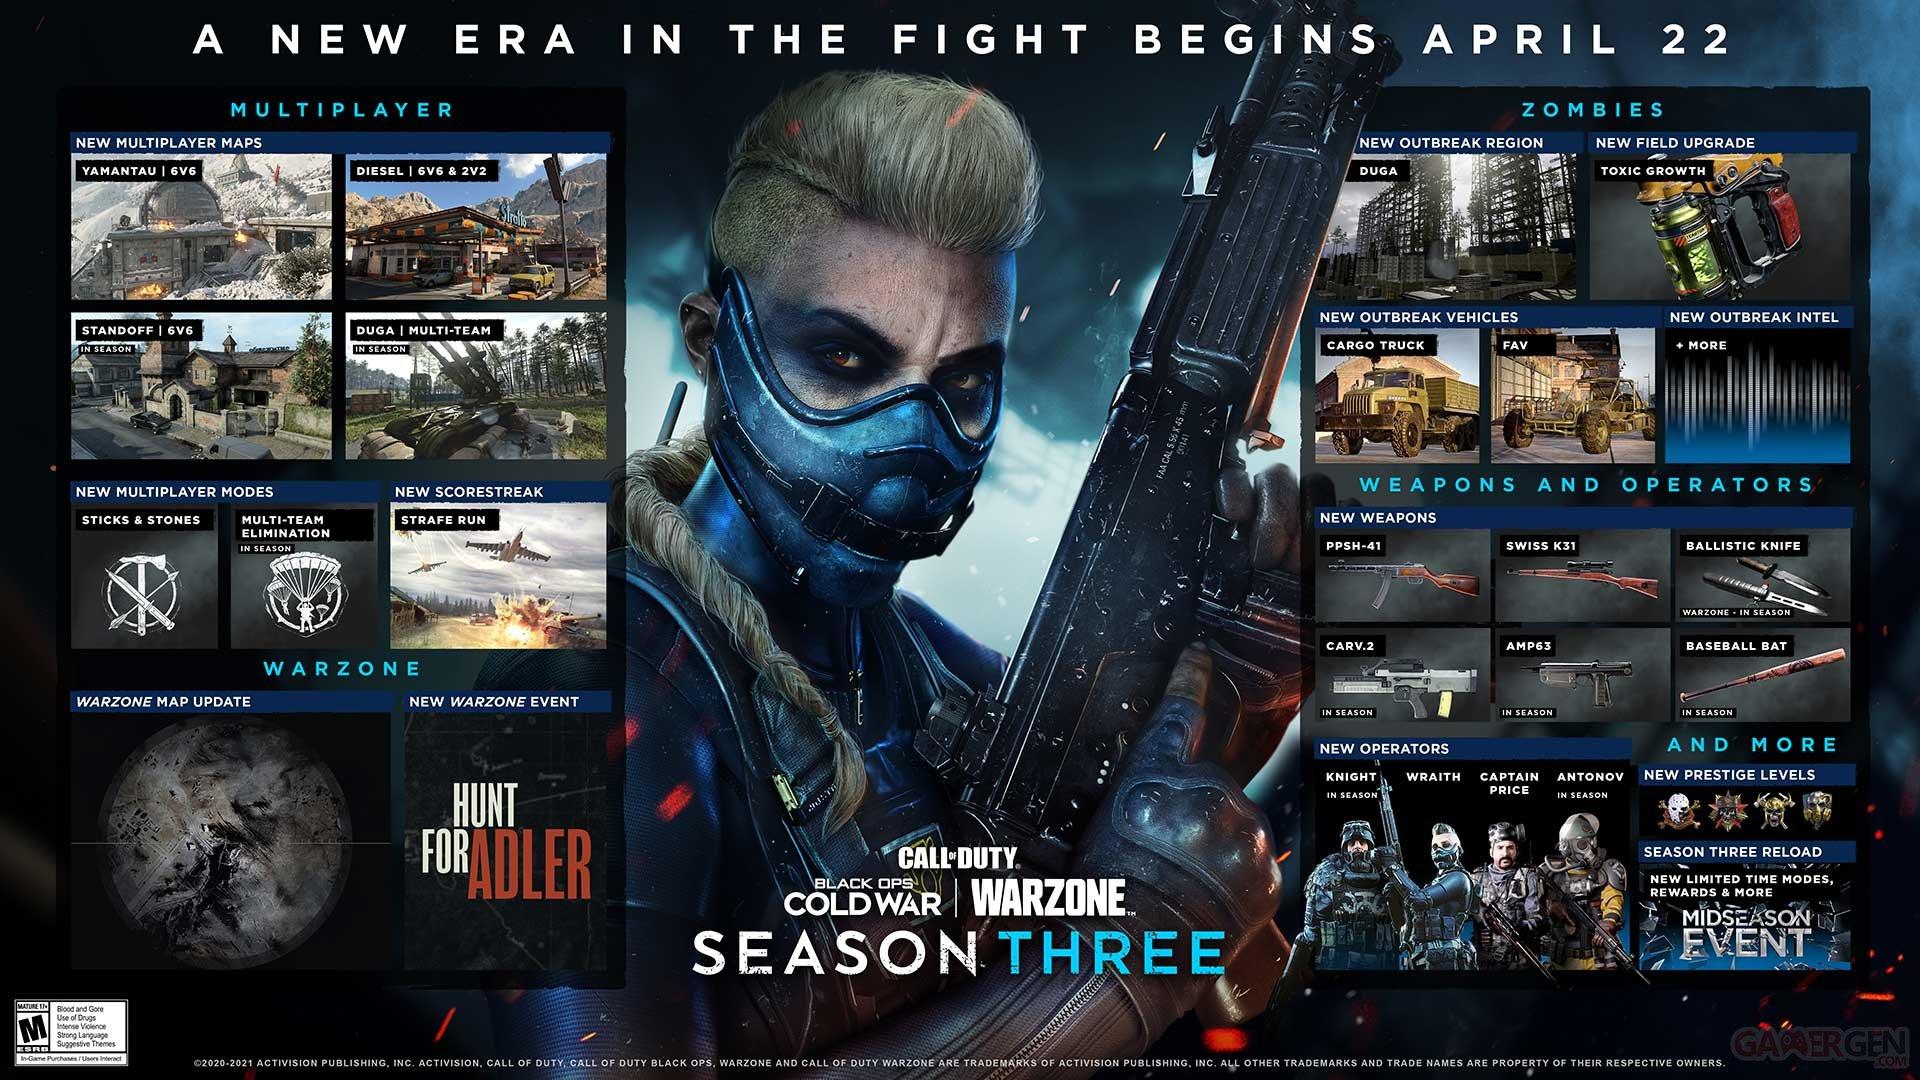 Call of duty black ops cold war saison 3